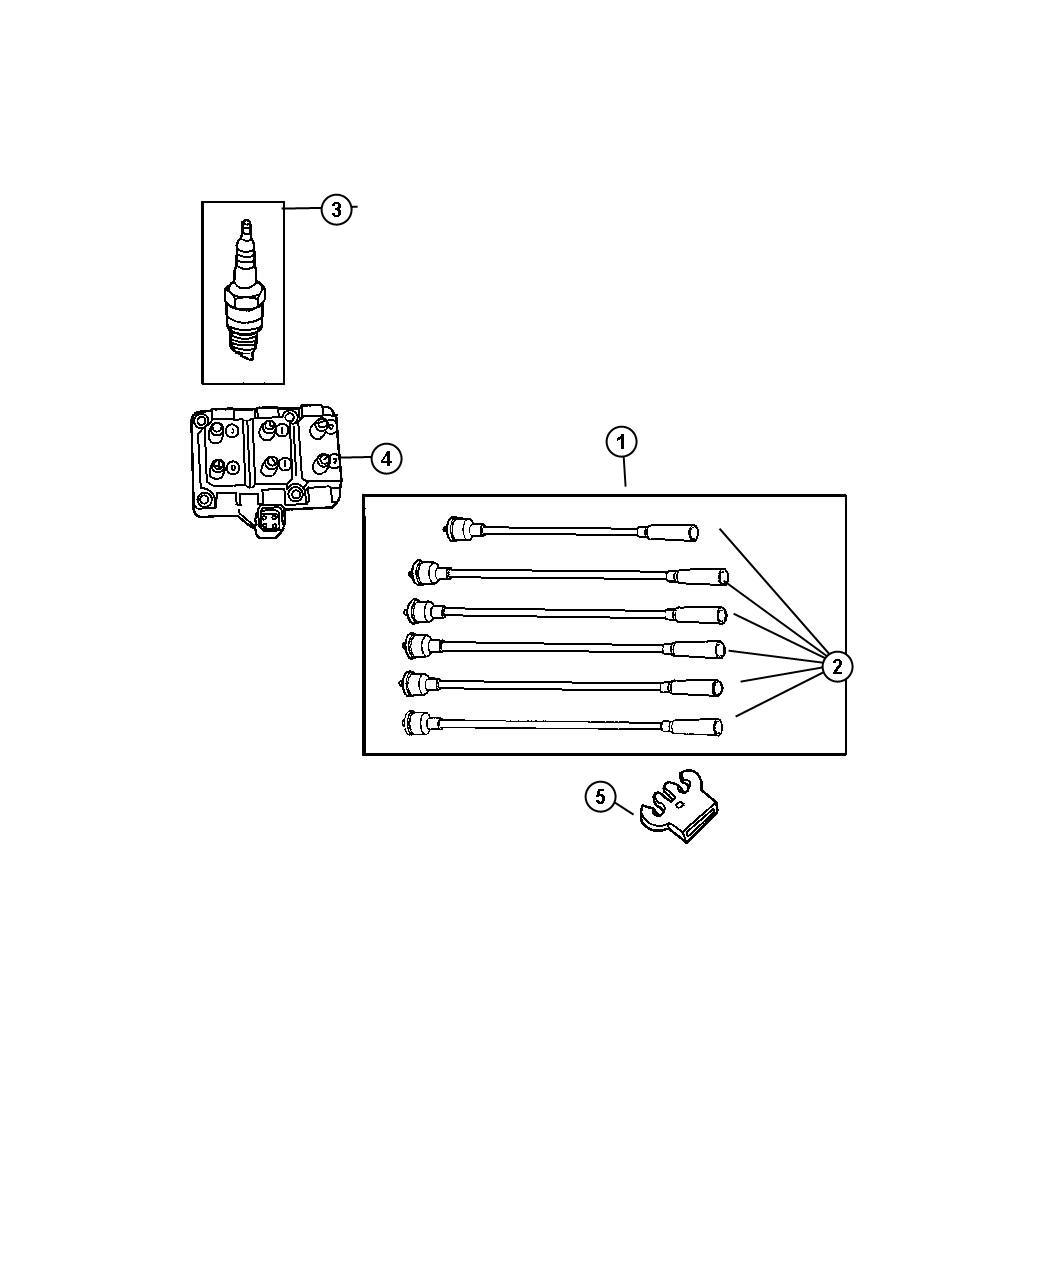 Jeep Wrangler Spark plug. Re-14-plp5. Wires